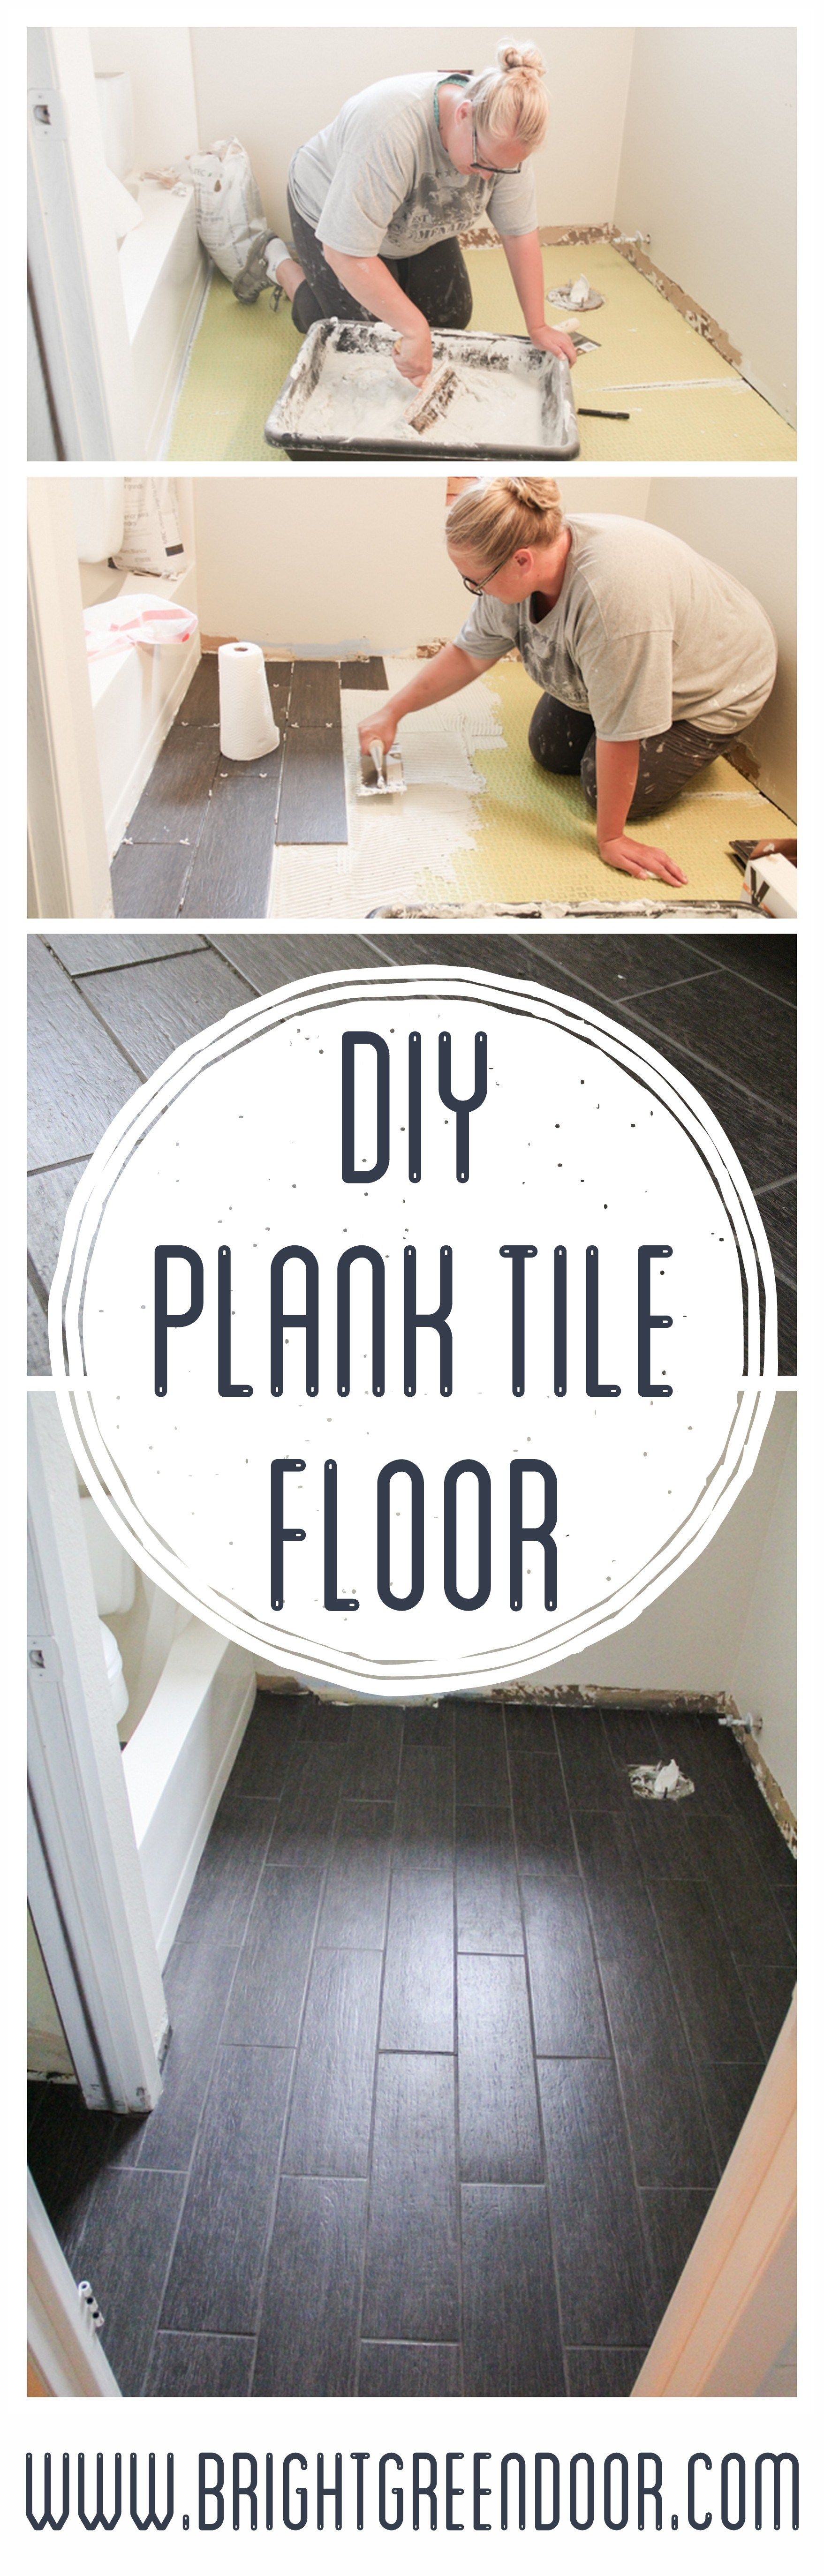 Diy Plank Tile Floor Fail Blogging Buddies Pinterest Tile